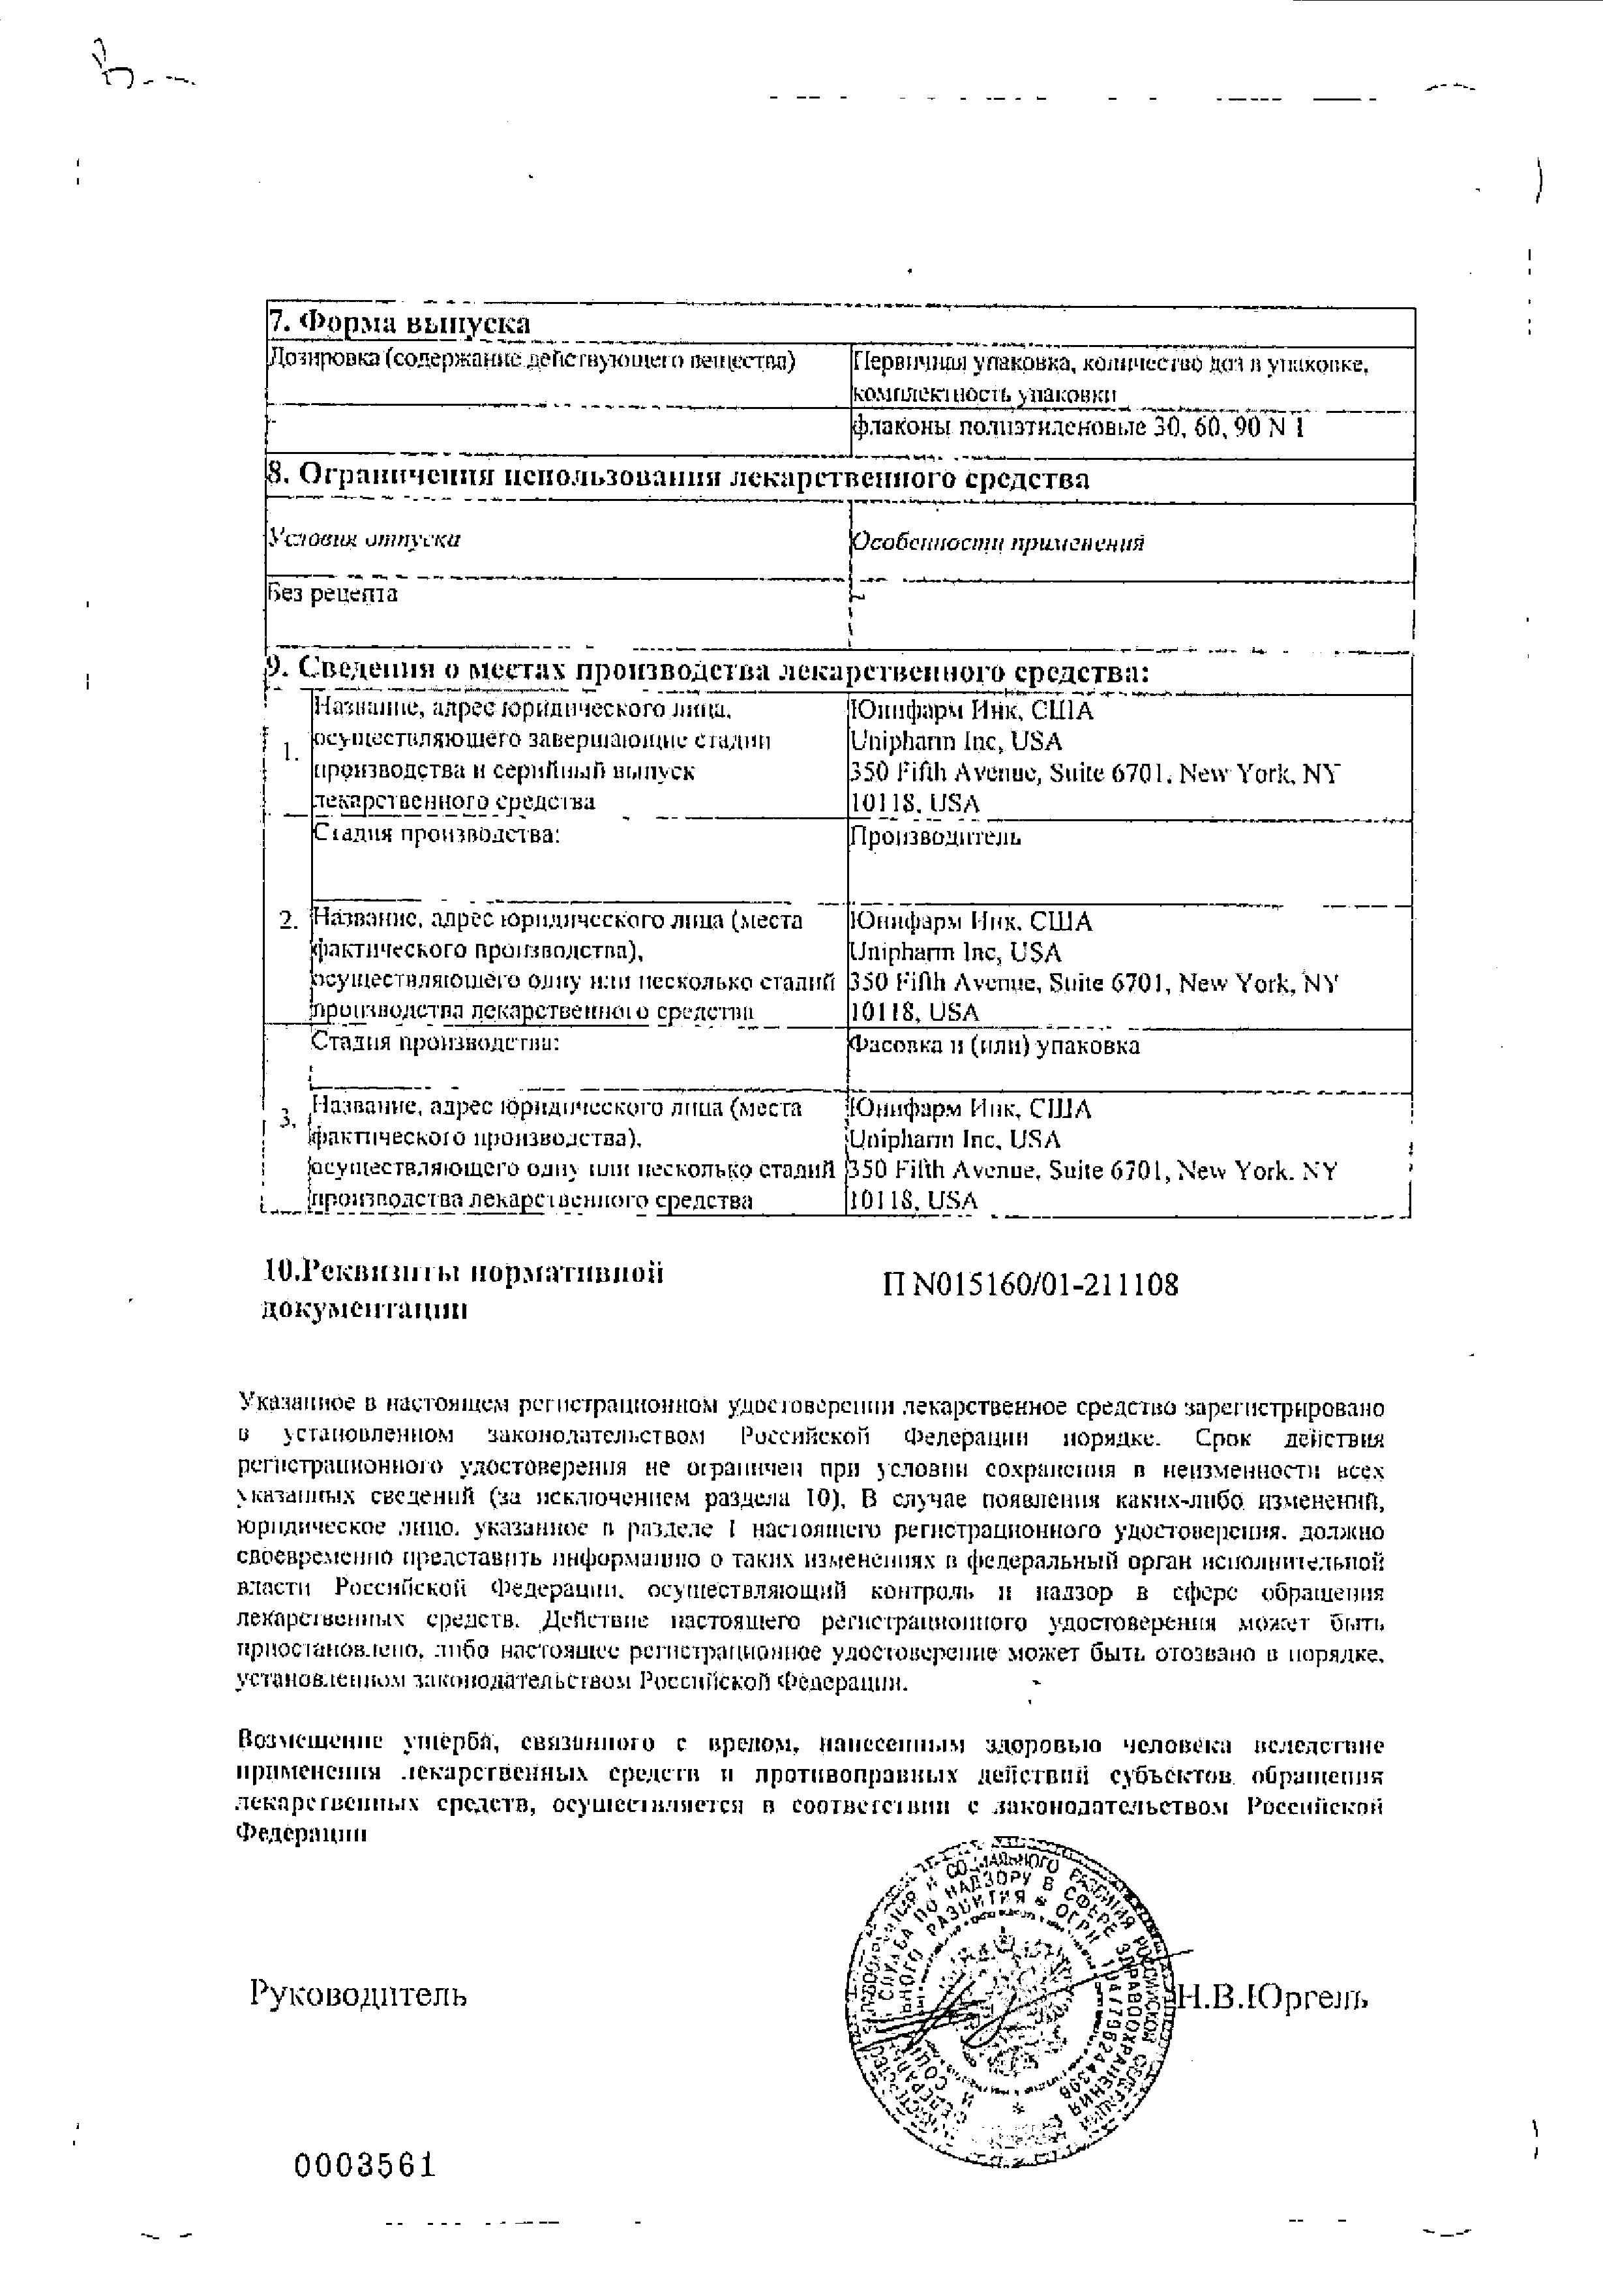 Витрум Юниор плюс сертификат